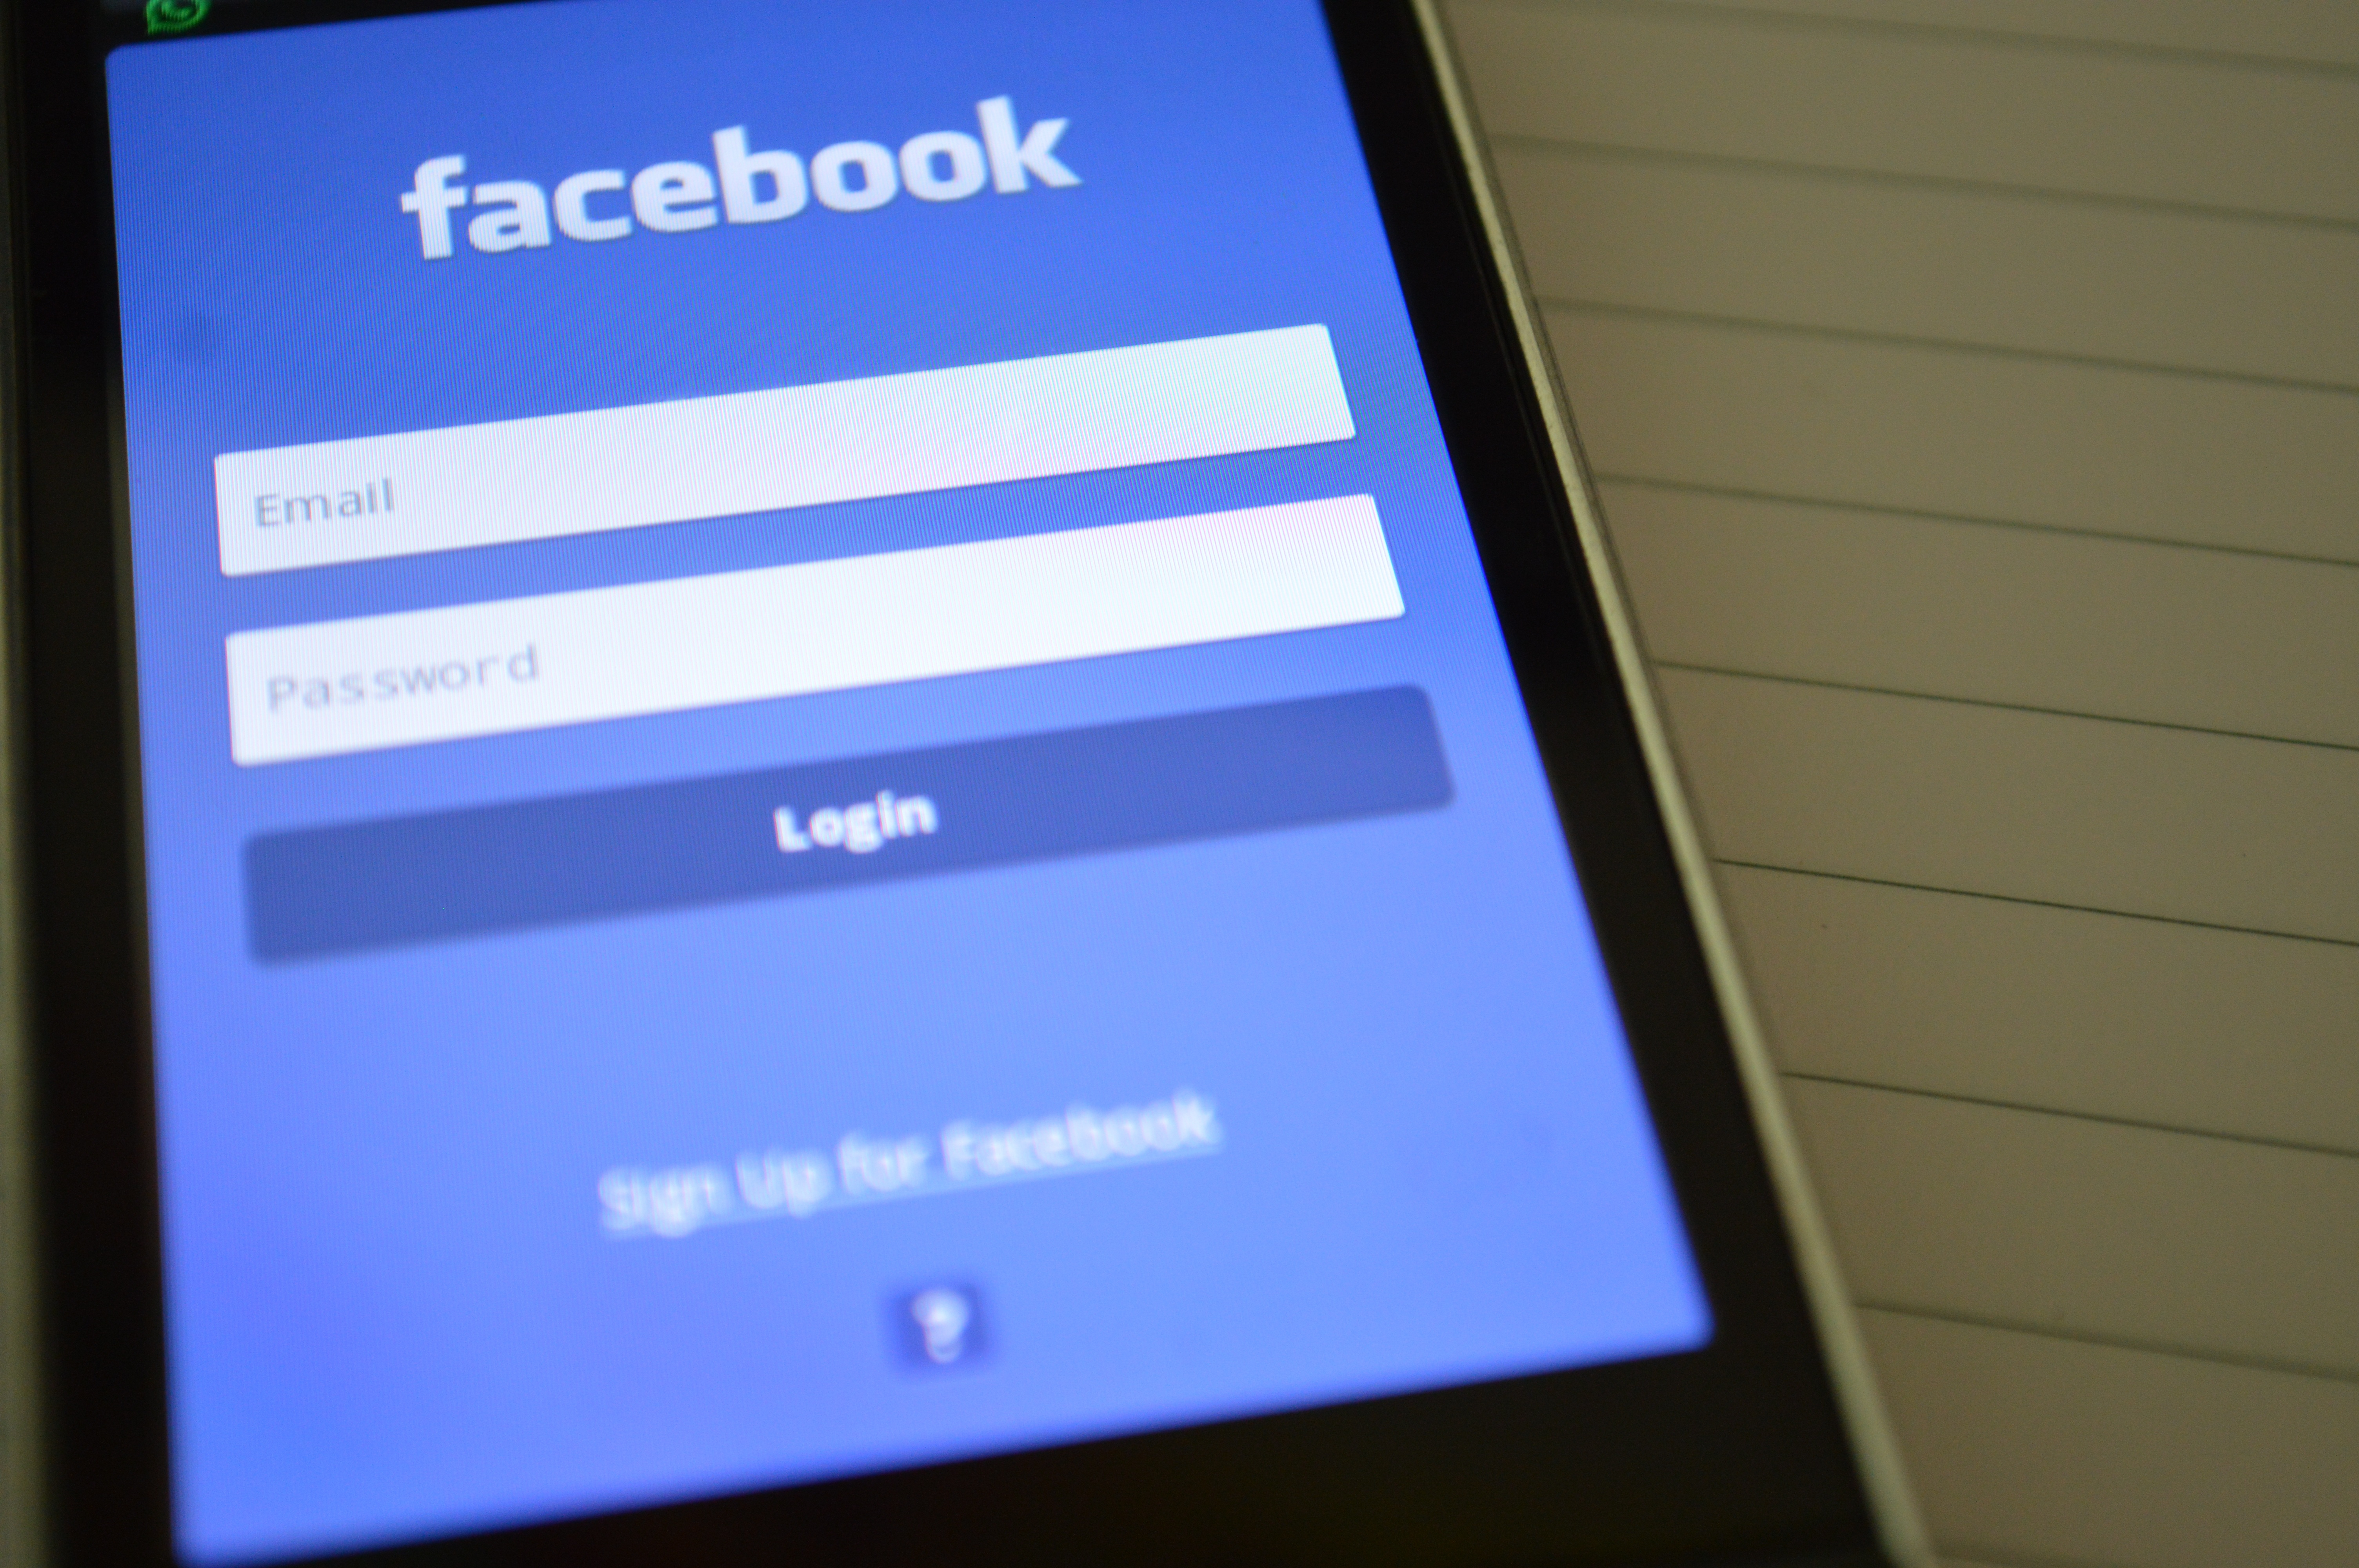 Health Experts Urge Facebook CEO Mark Zuckerberg to